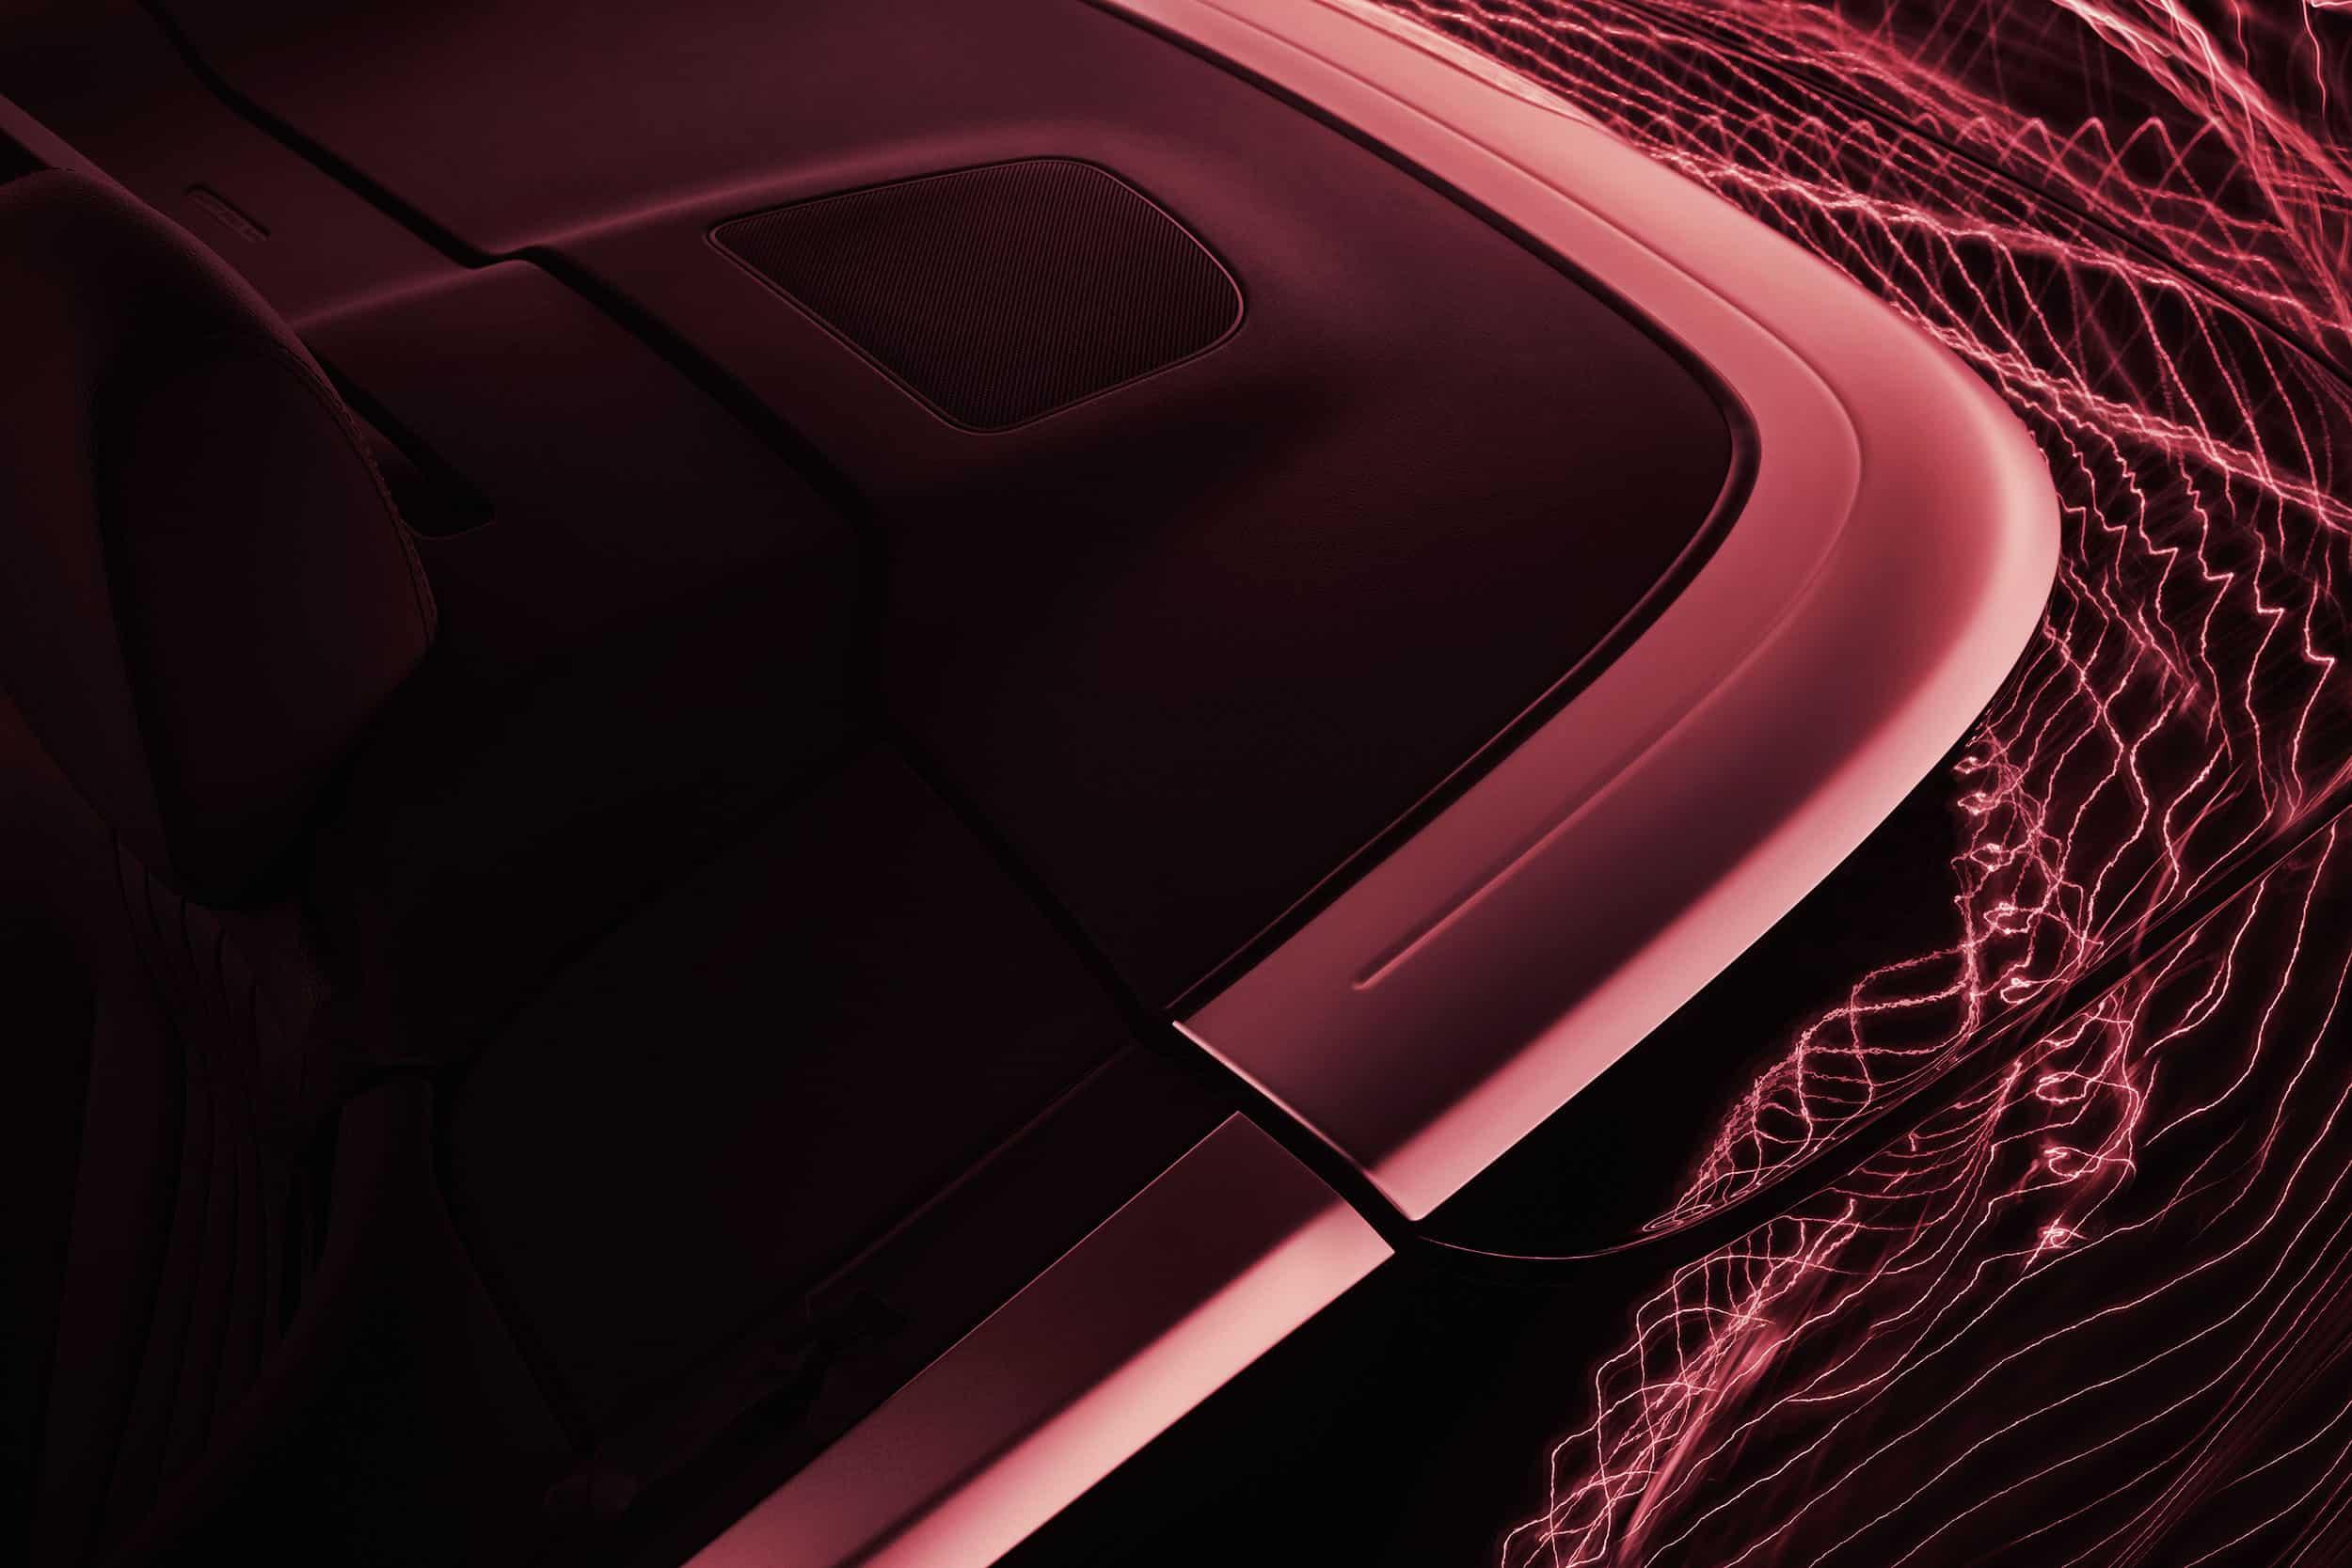 studio-ignatov-wkw-automotive-imagekampagne-08